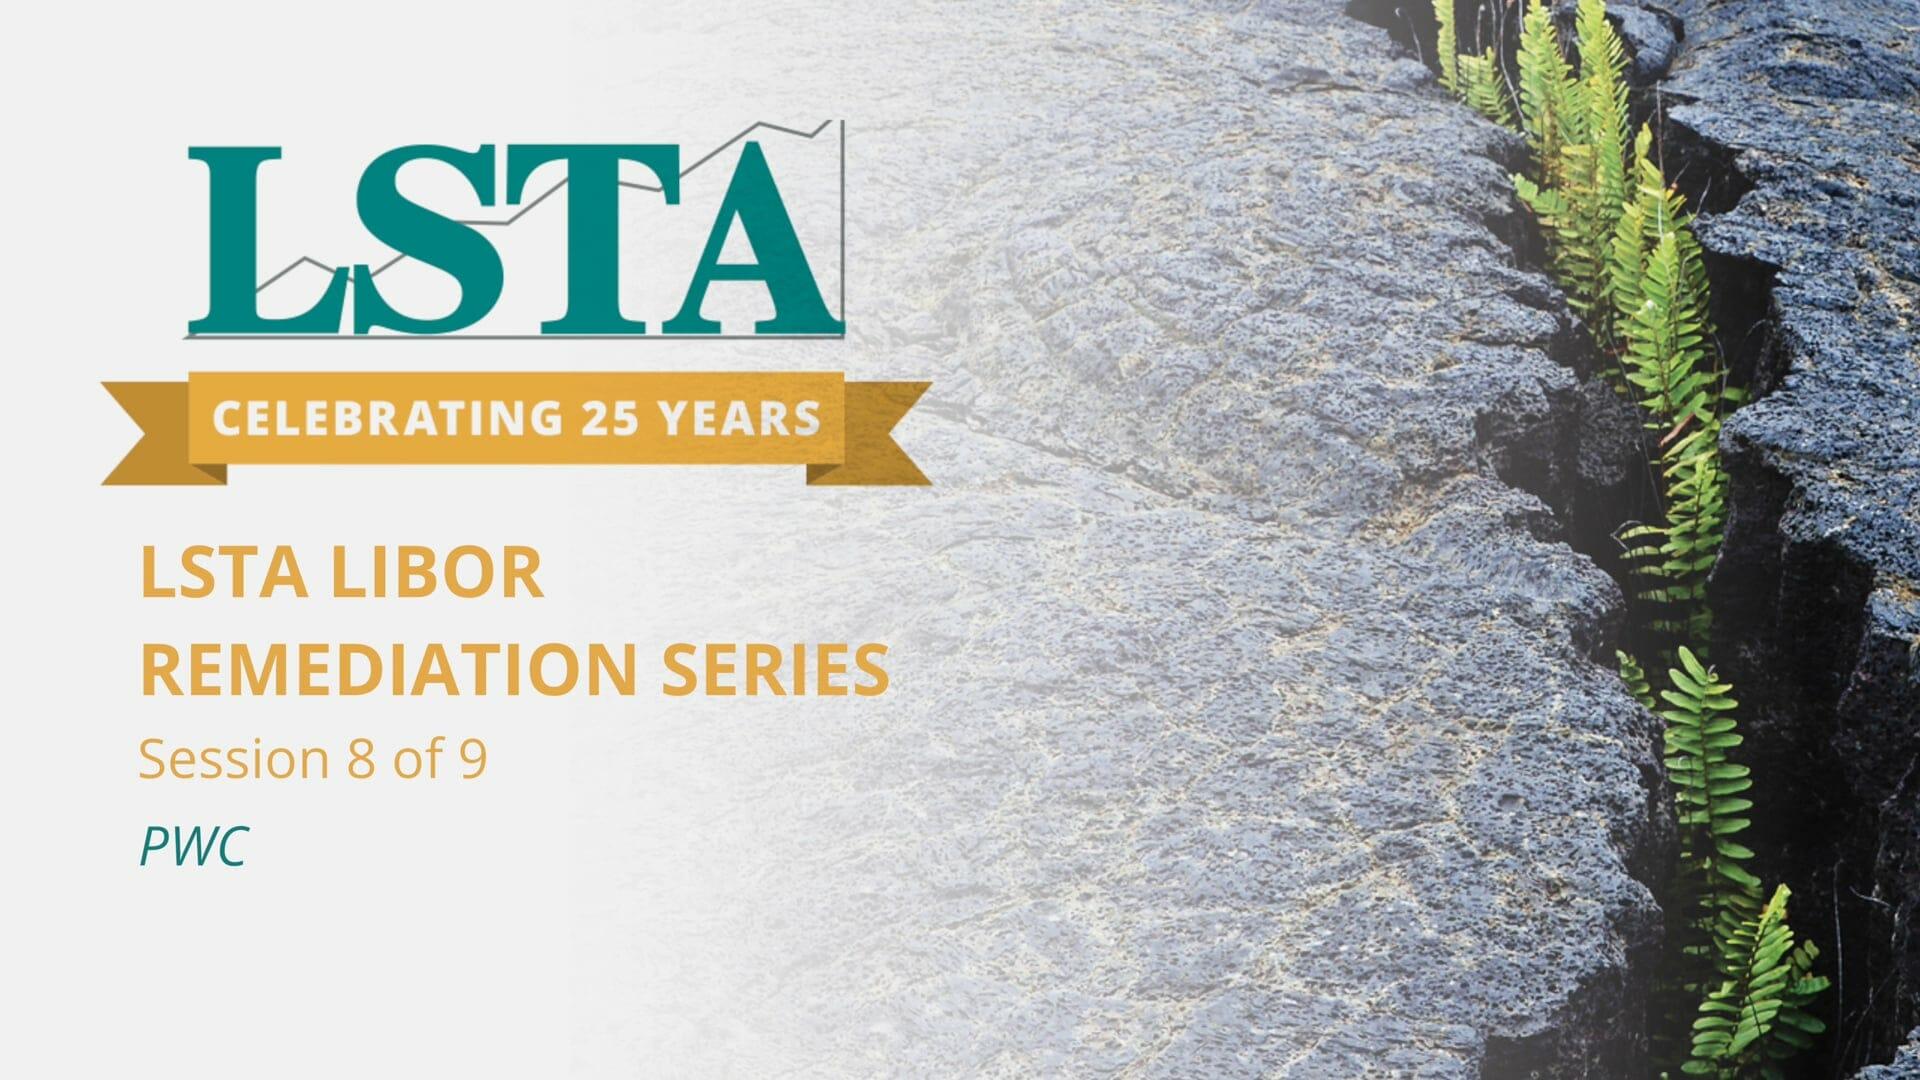 LSTA LIBOR Remediation Series Video – PWC